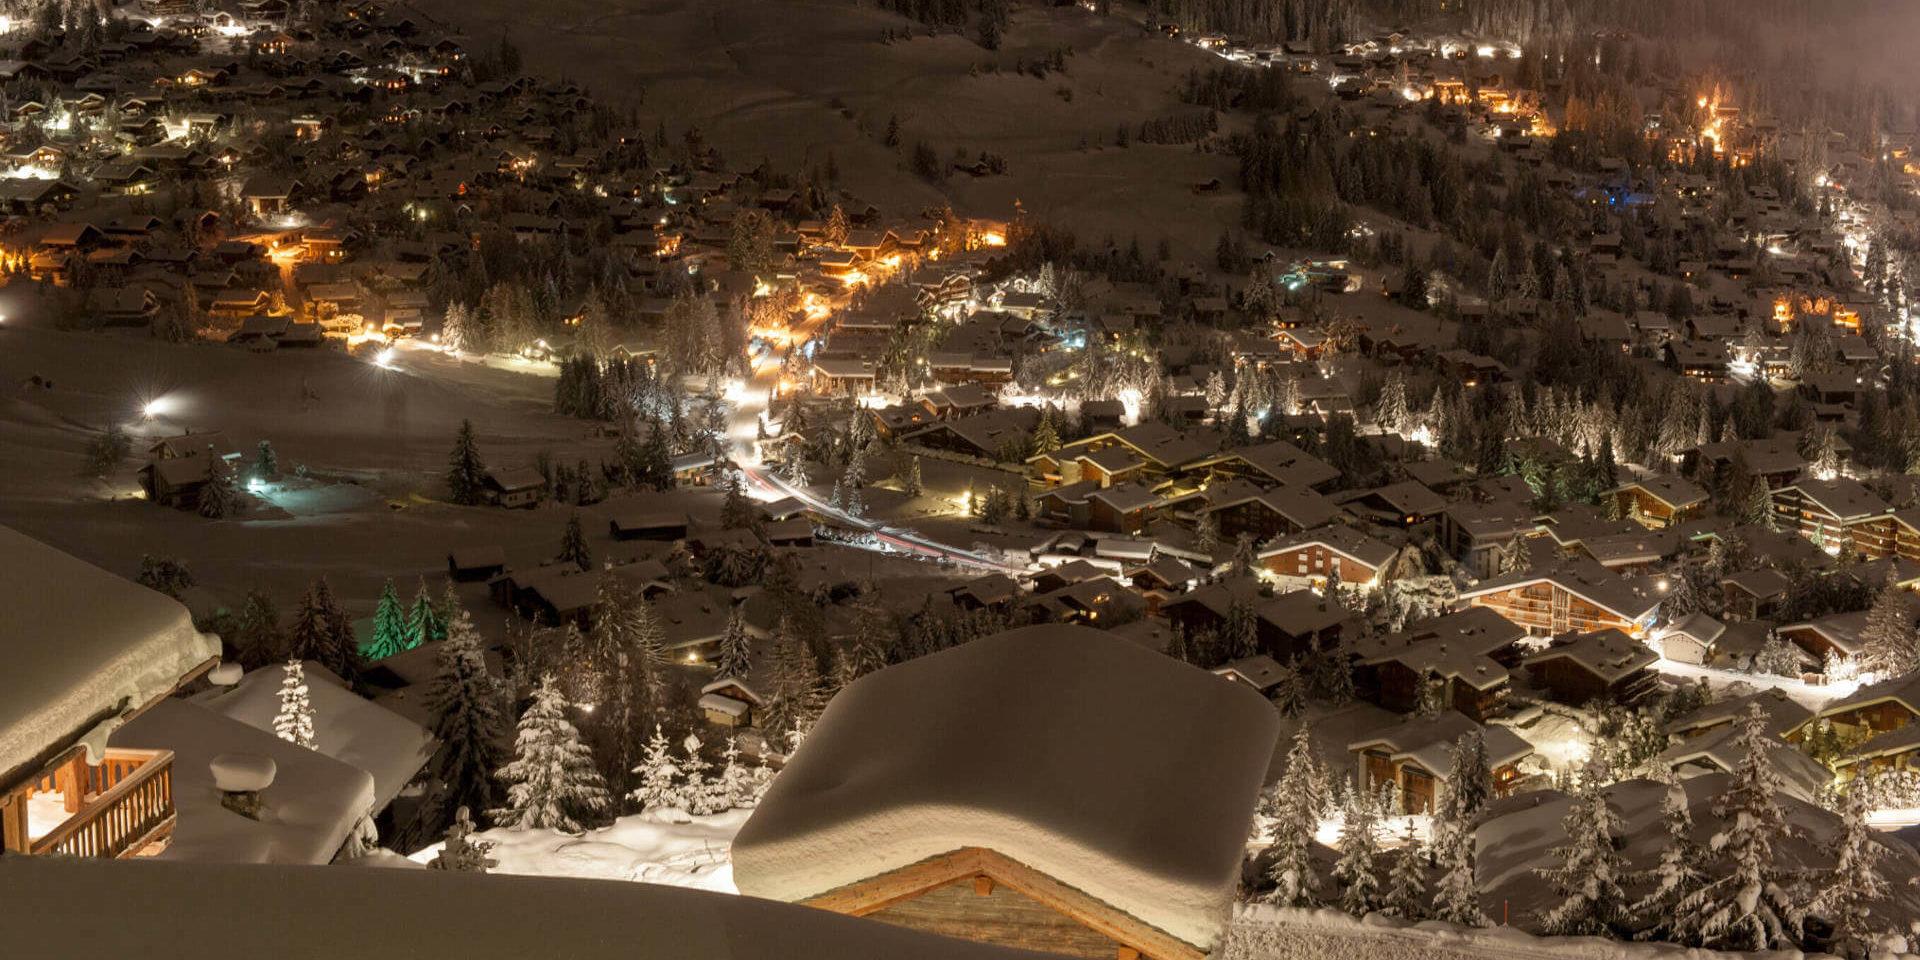 Chalet Nyumba Verbier Les 4 Vallees Zwitserland wintersport skivakantie luxe fantastisch uitzicht dorp sneeuw bergen bomen by night